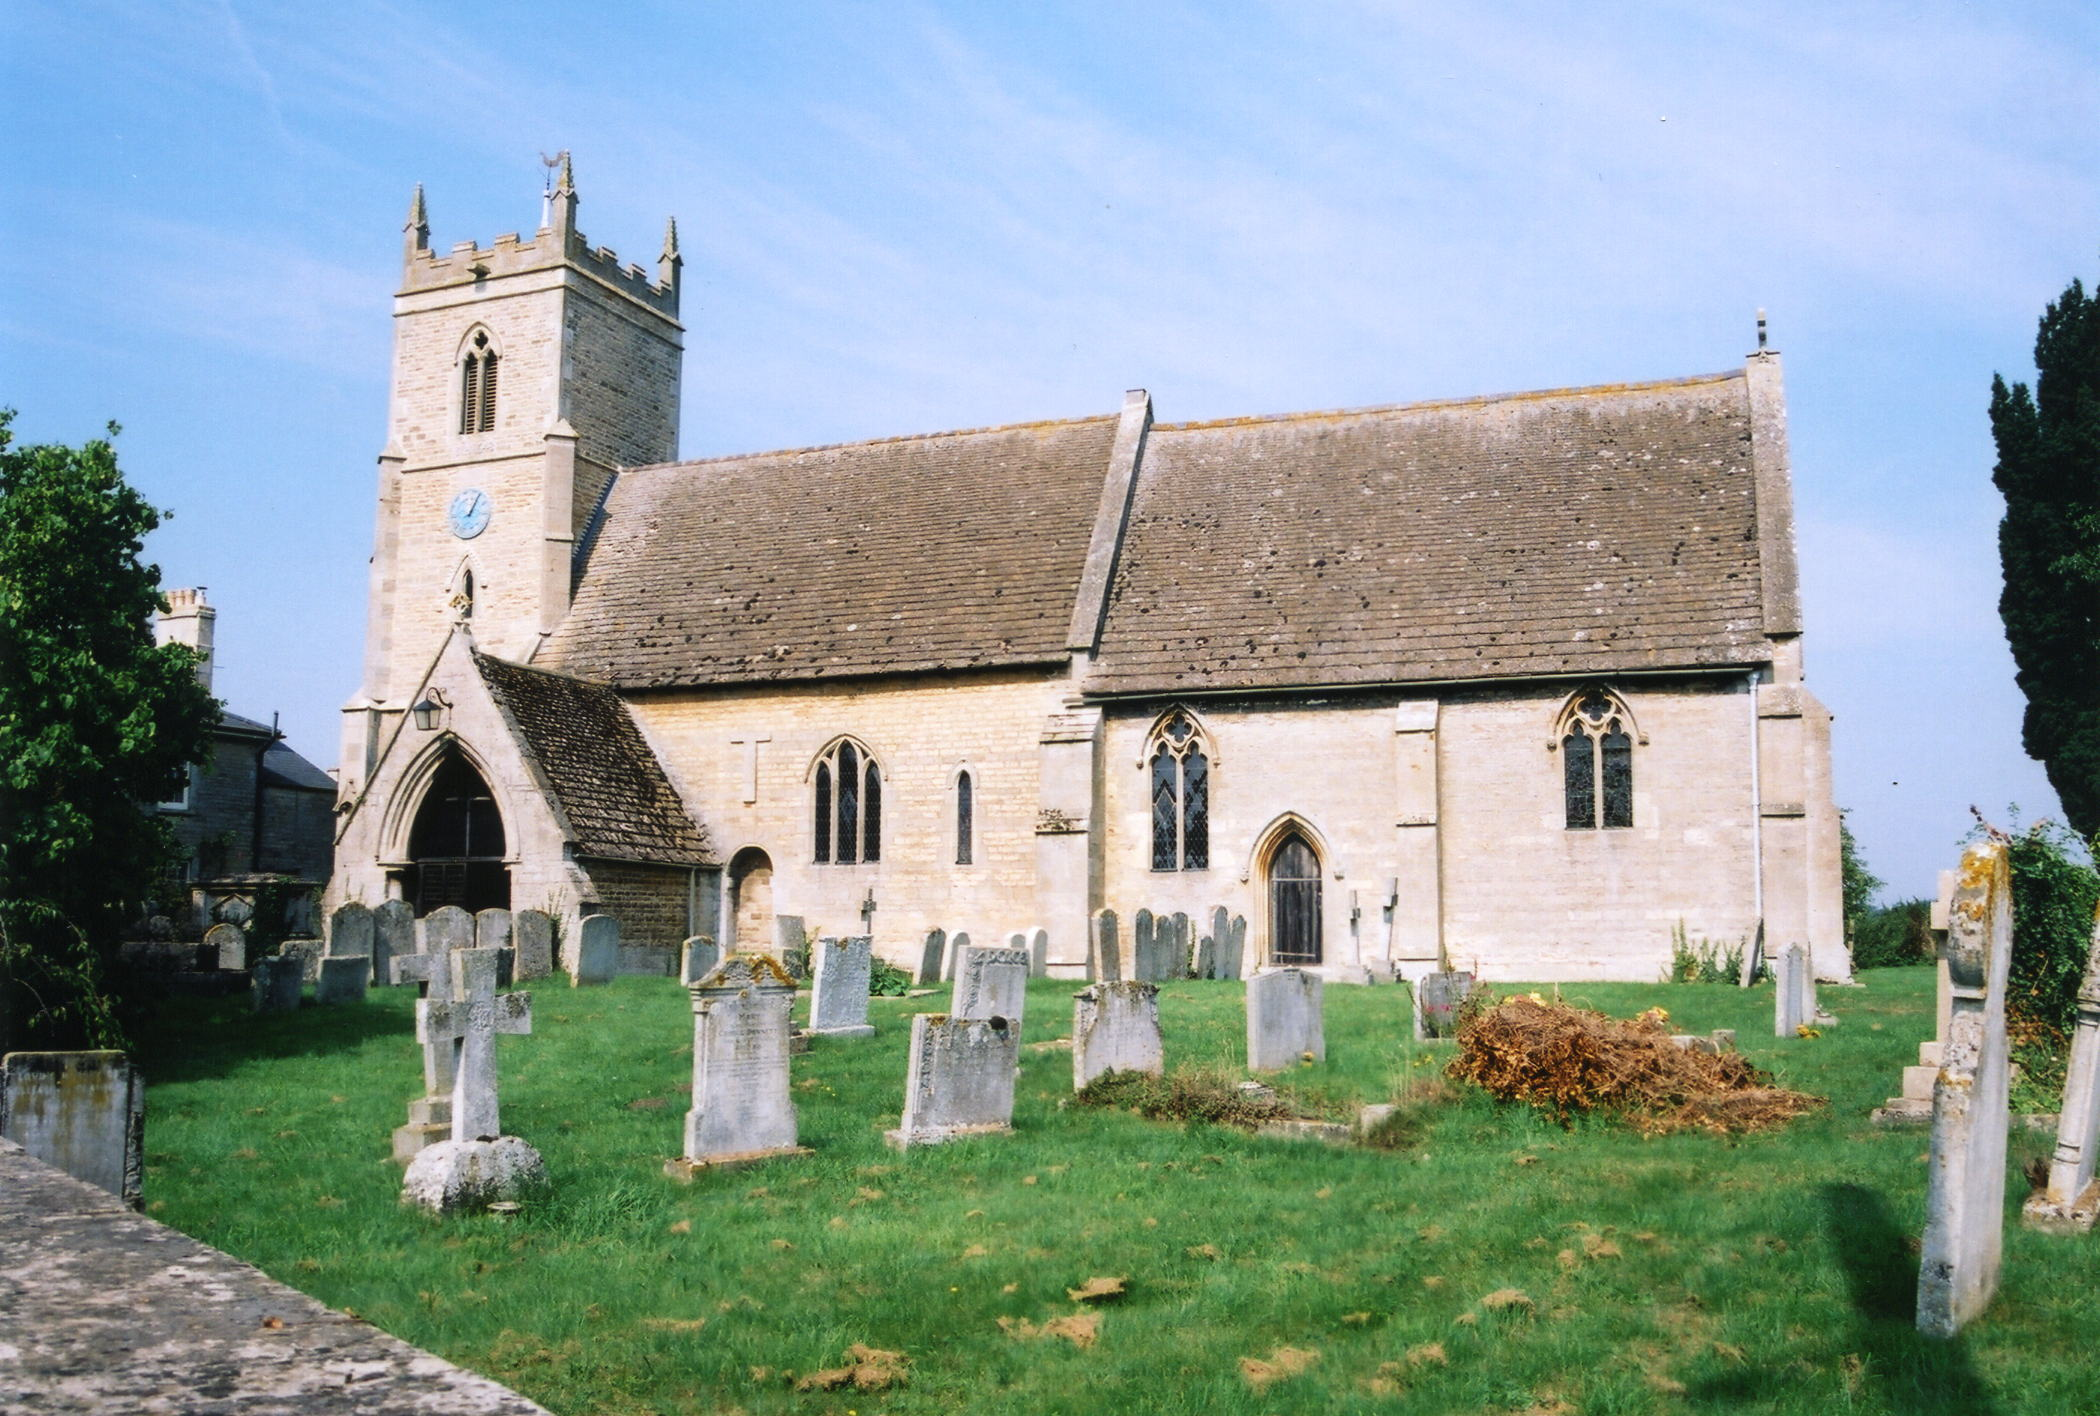 Barholm St. Martin's parish church